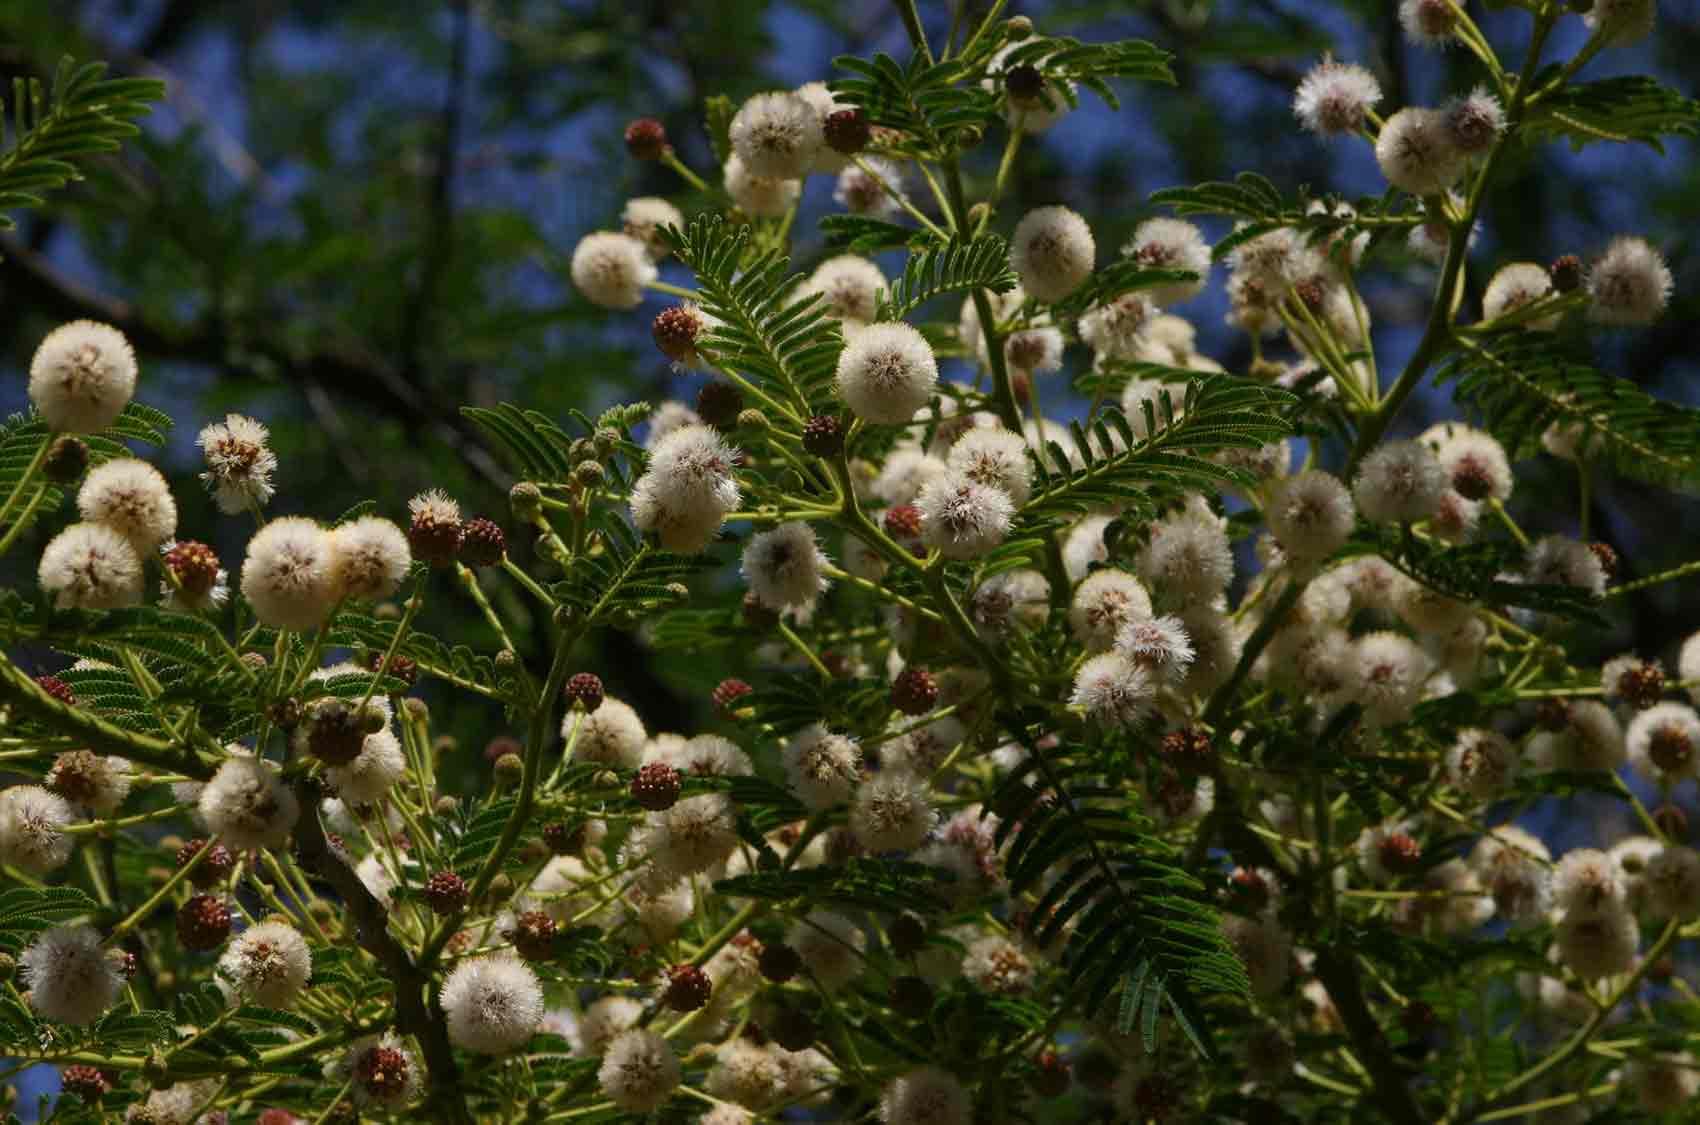 Acacia sieberiana var. woodii